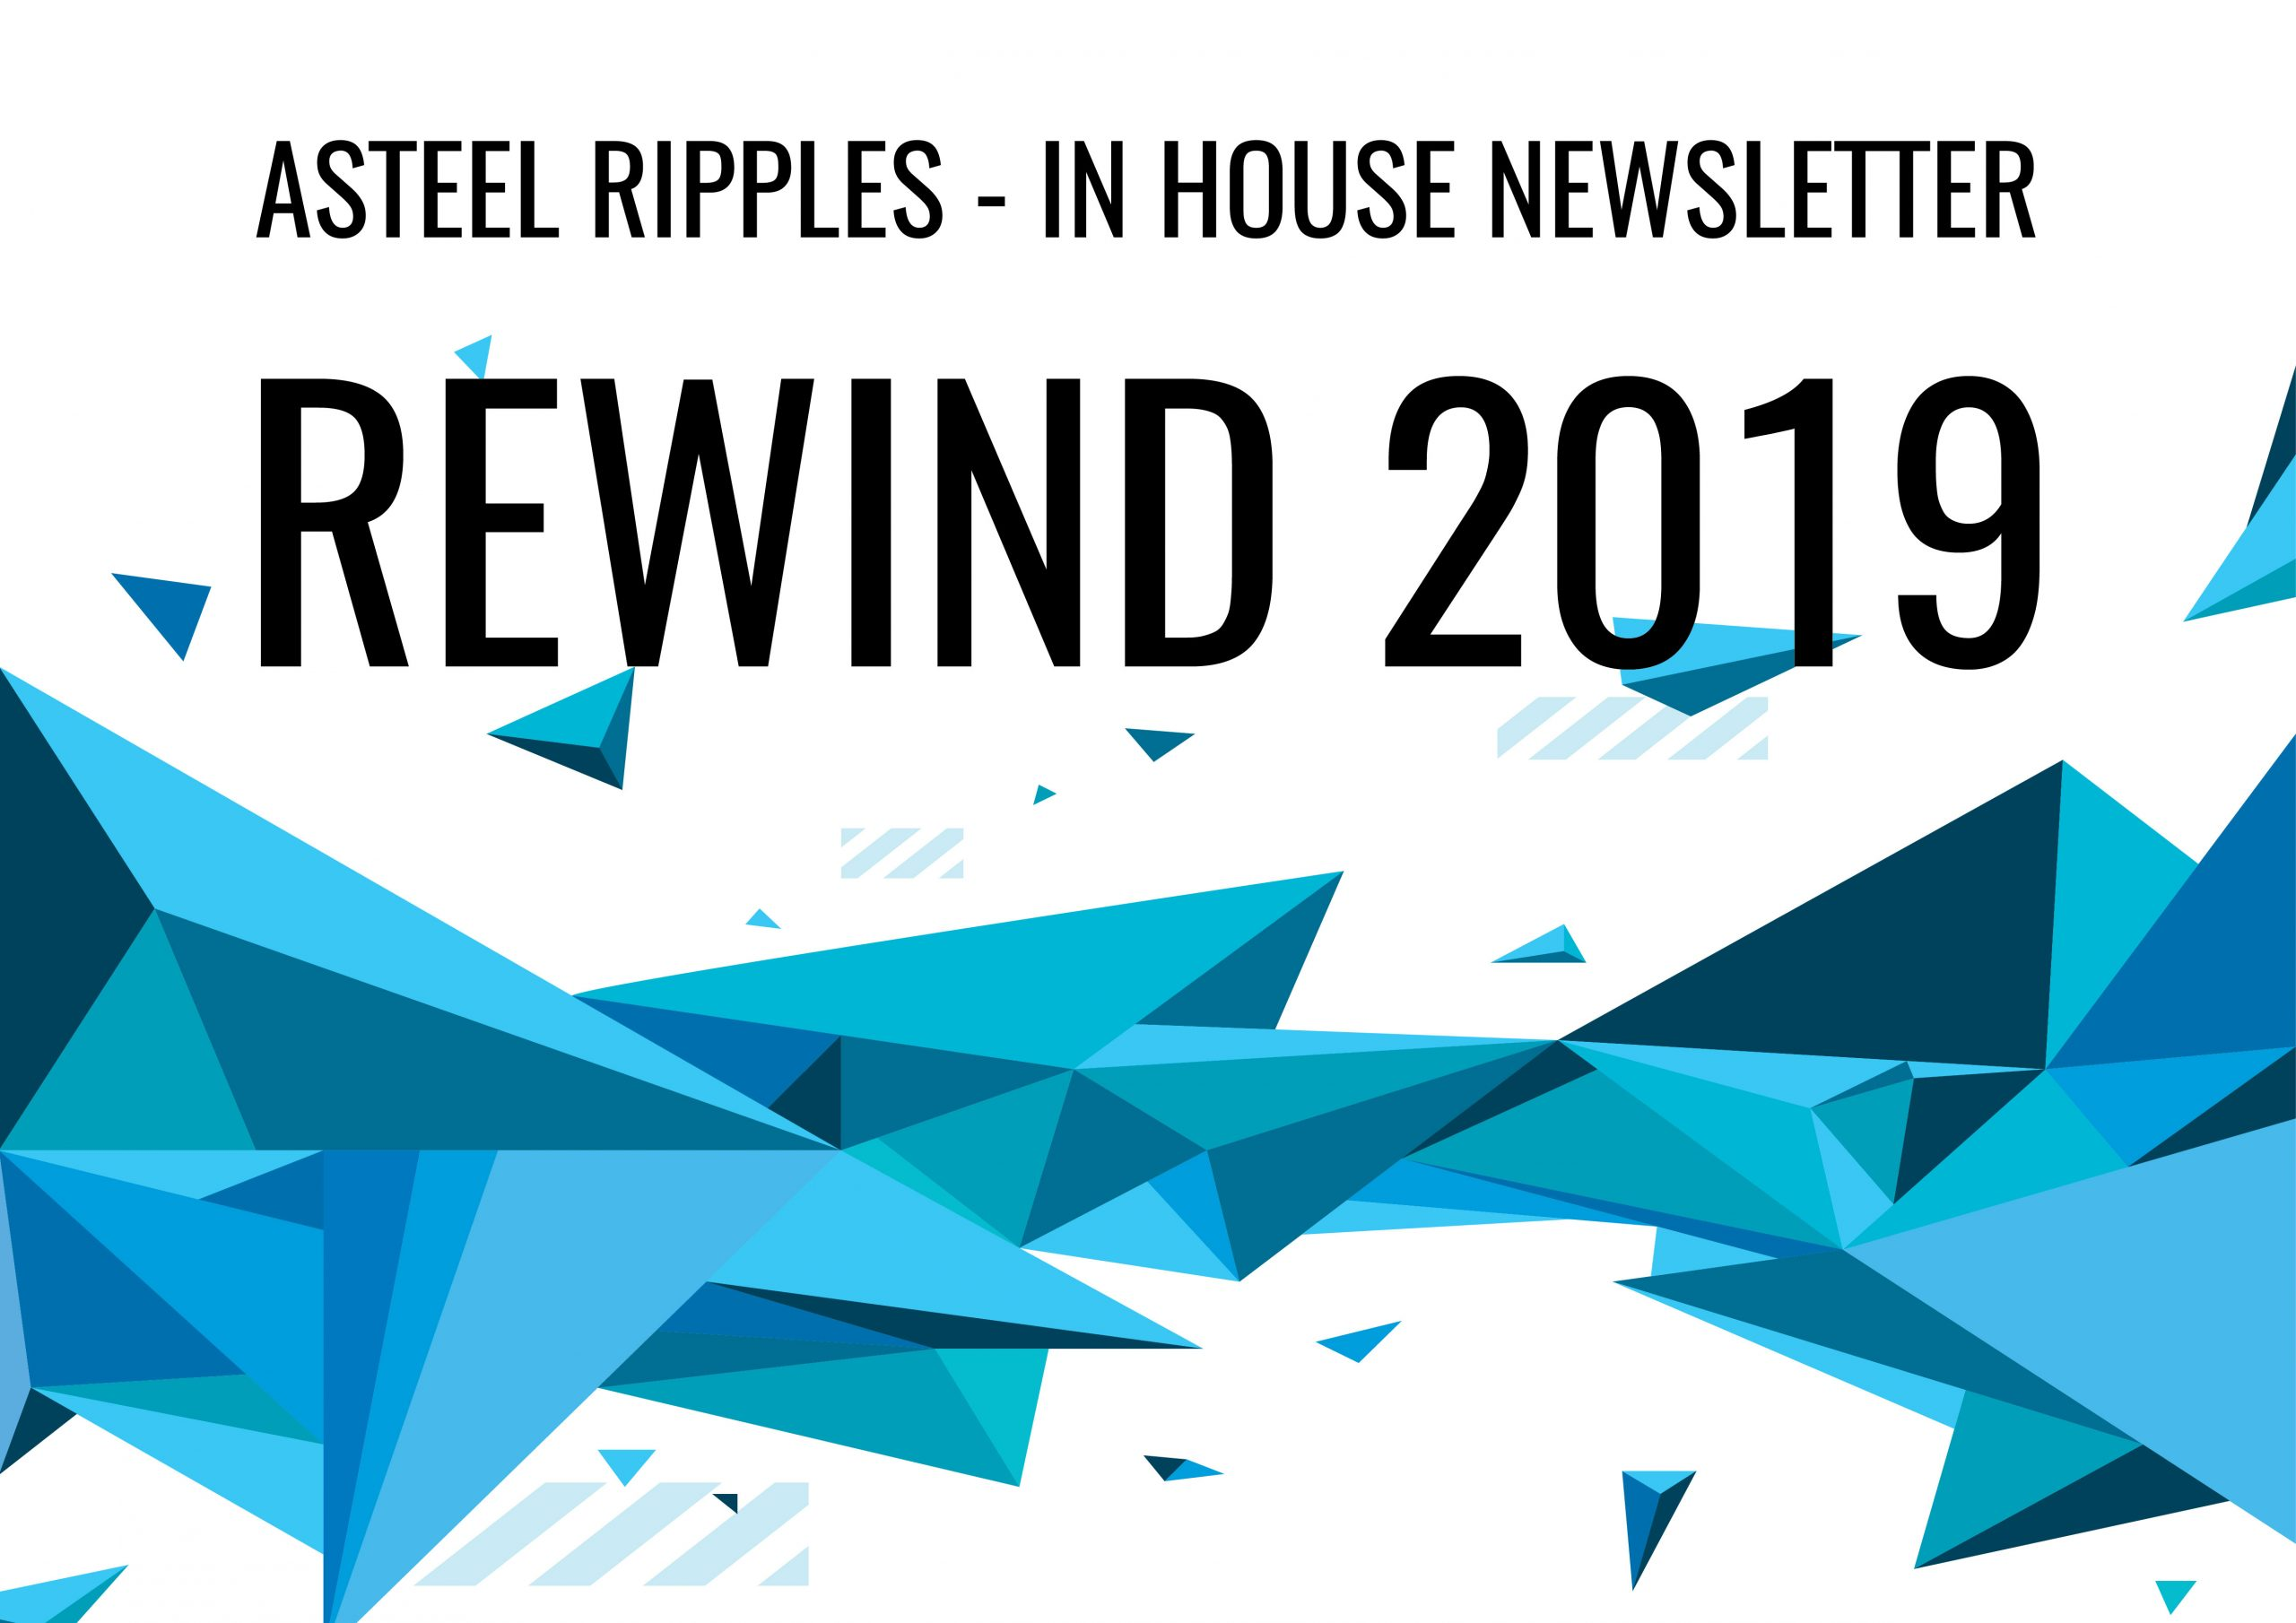 ASTEEL Ripples 2.0 - Rewind 2019